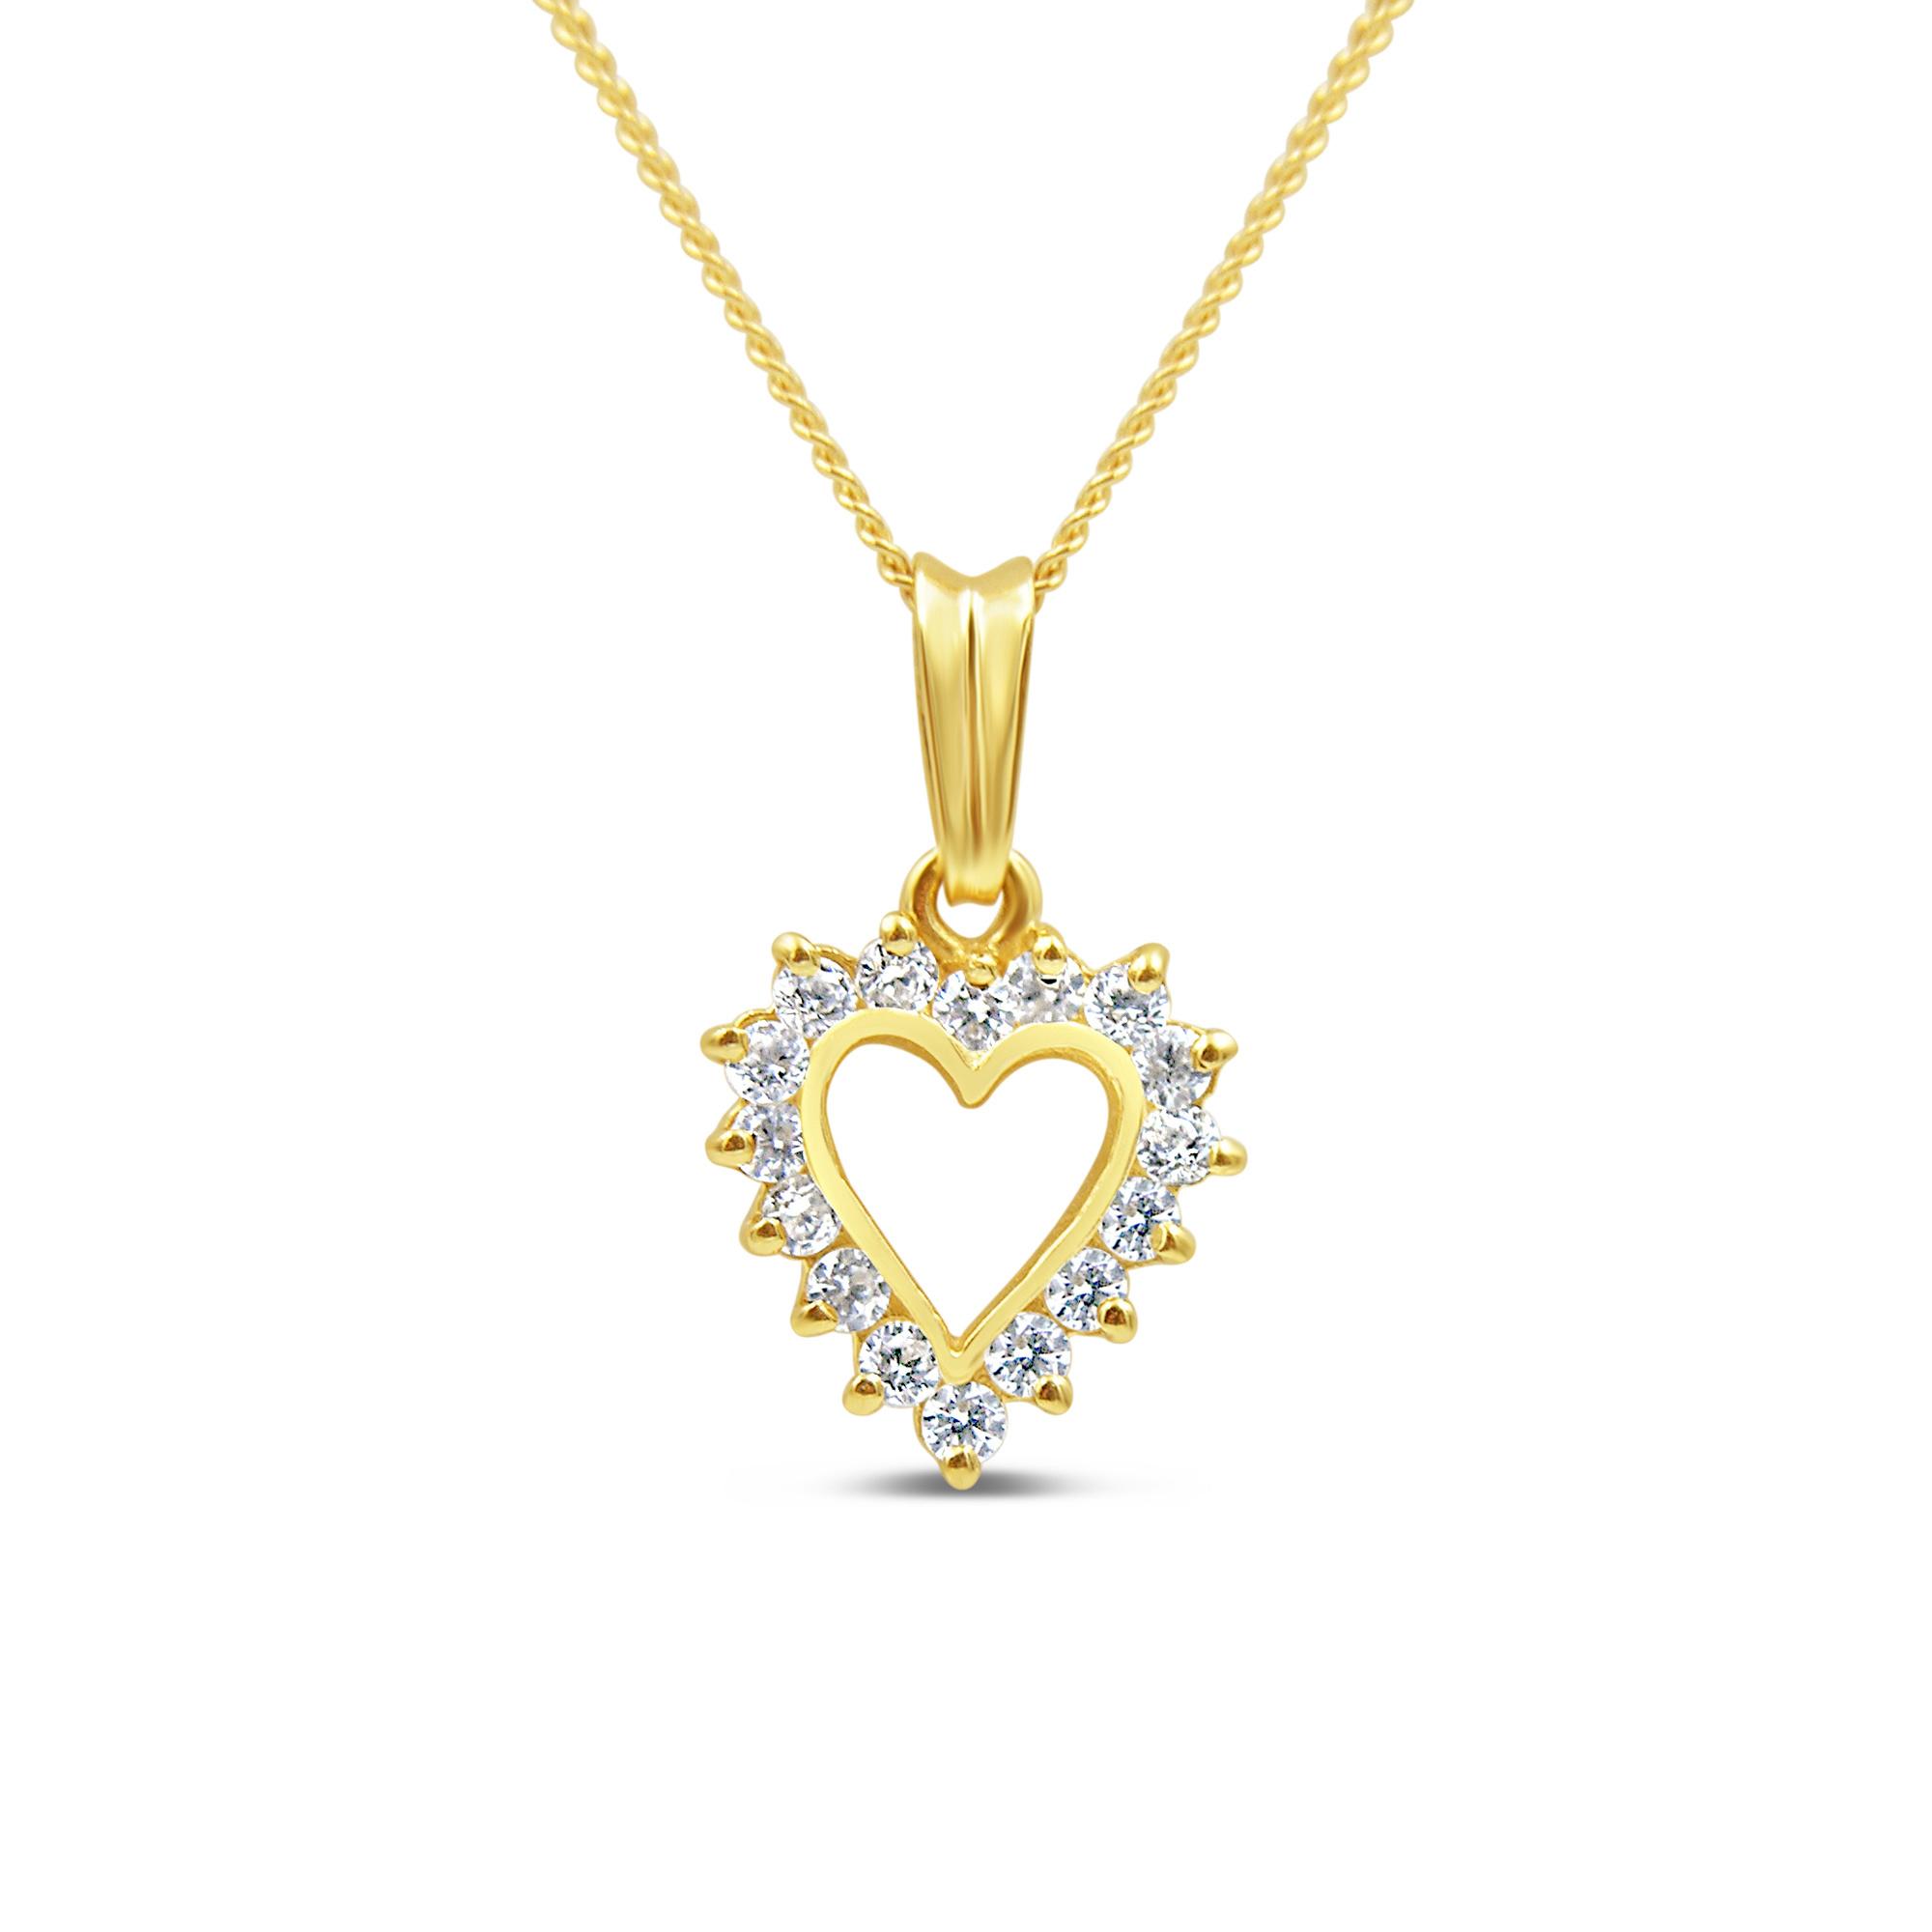 14kt yellow gold heart pendant with zirconia